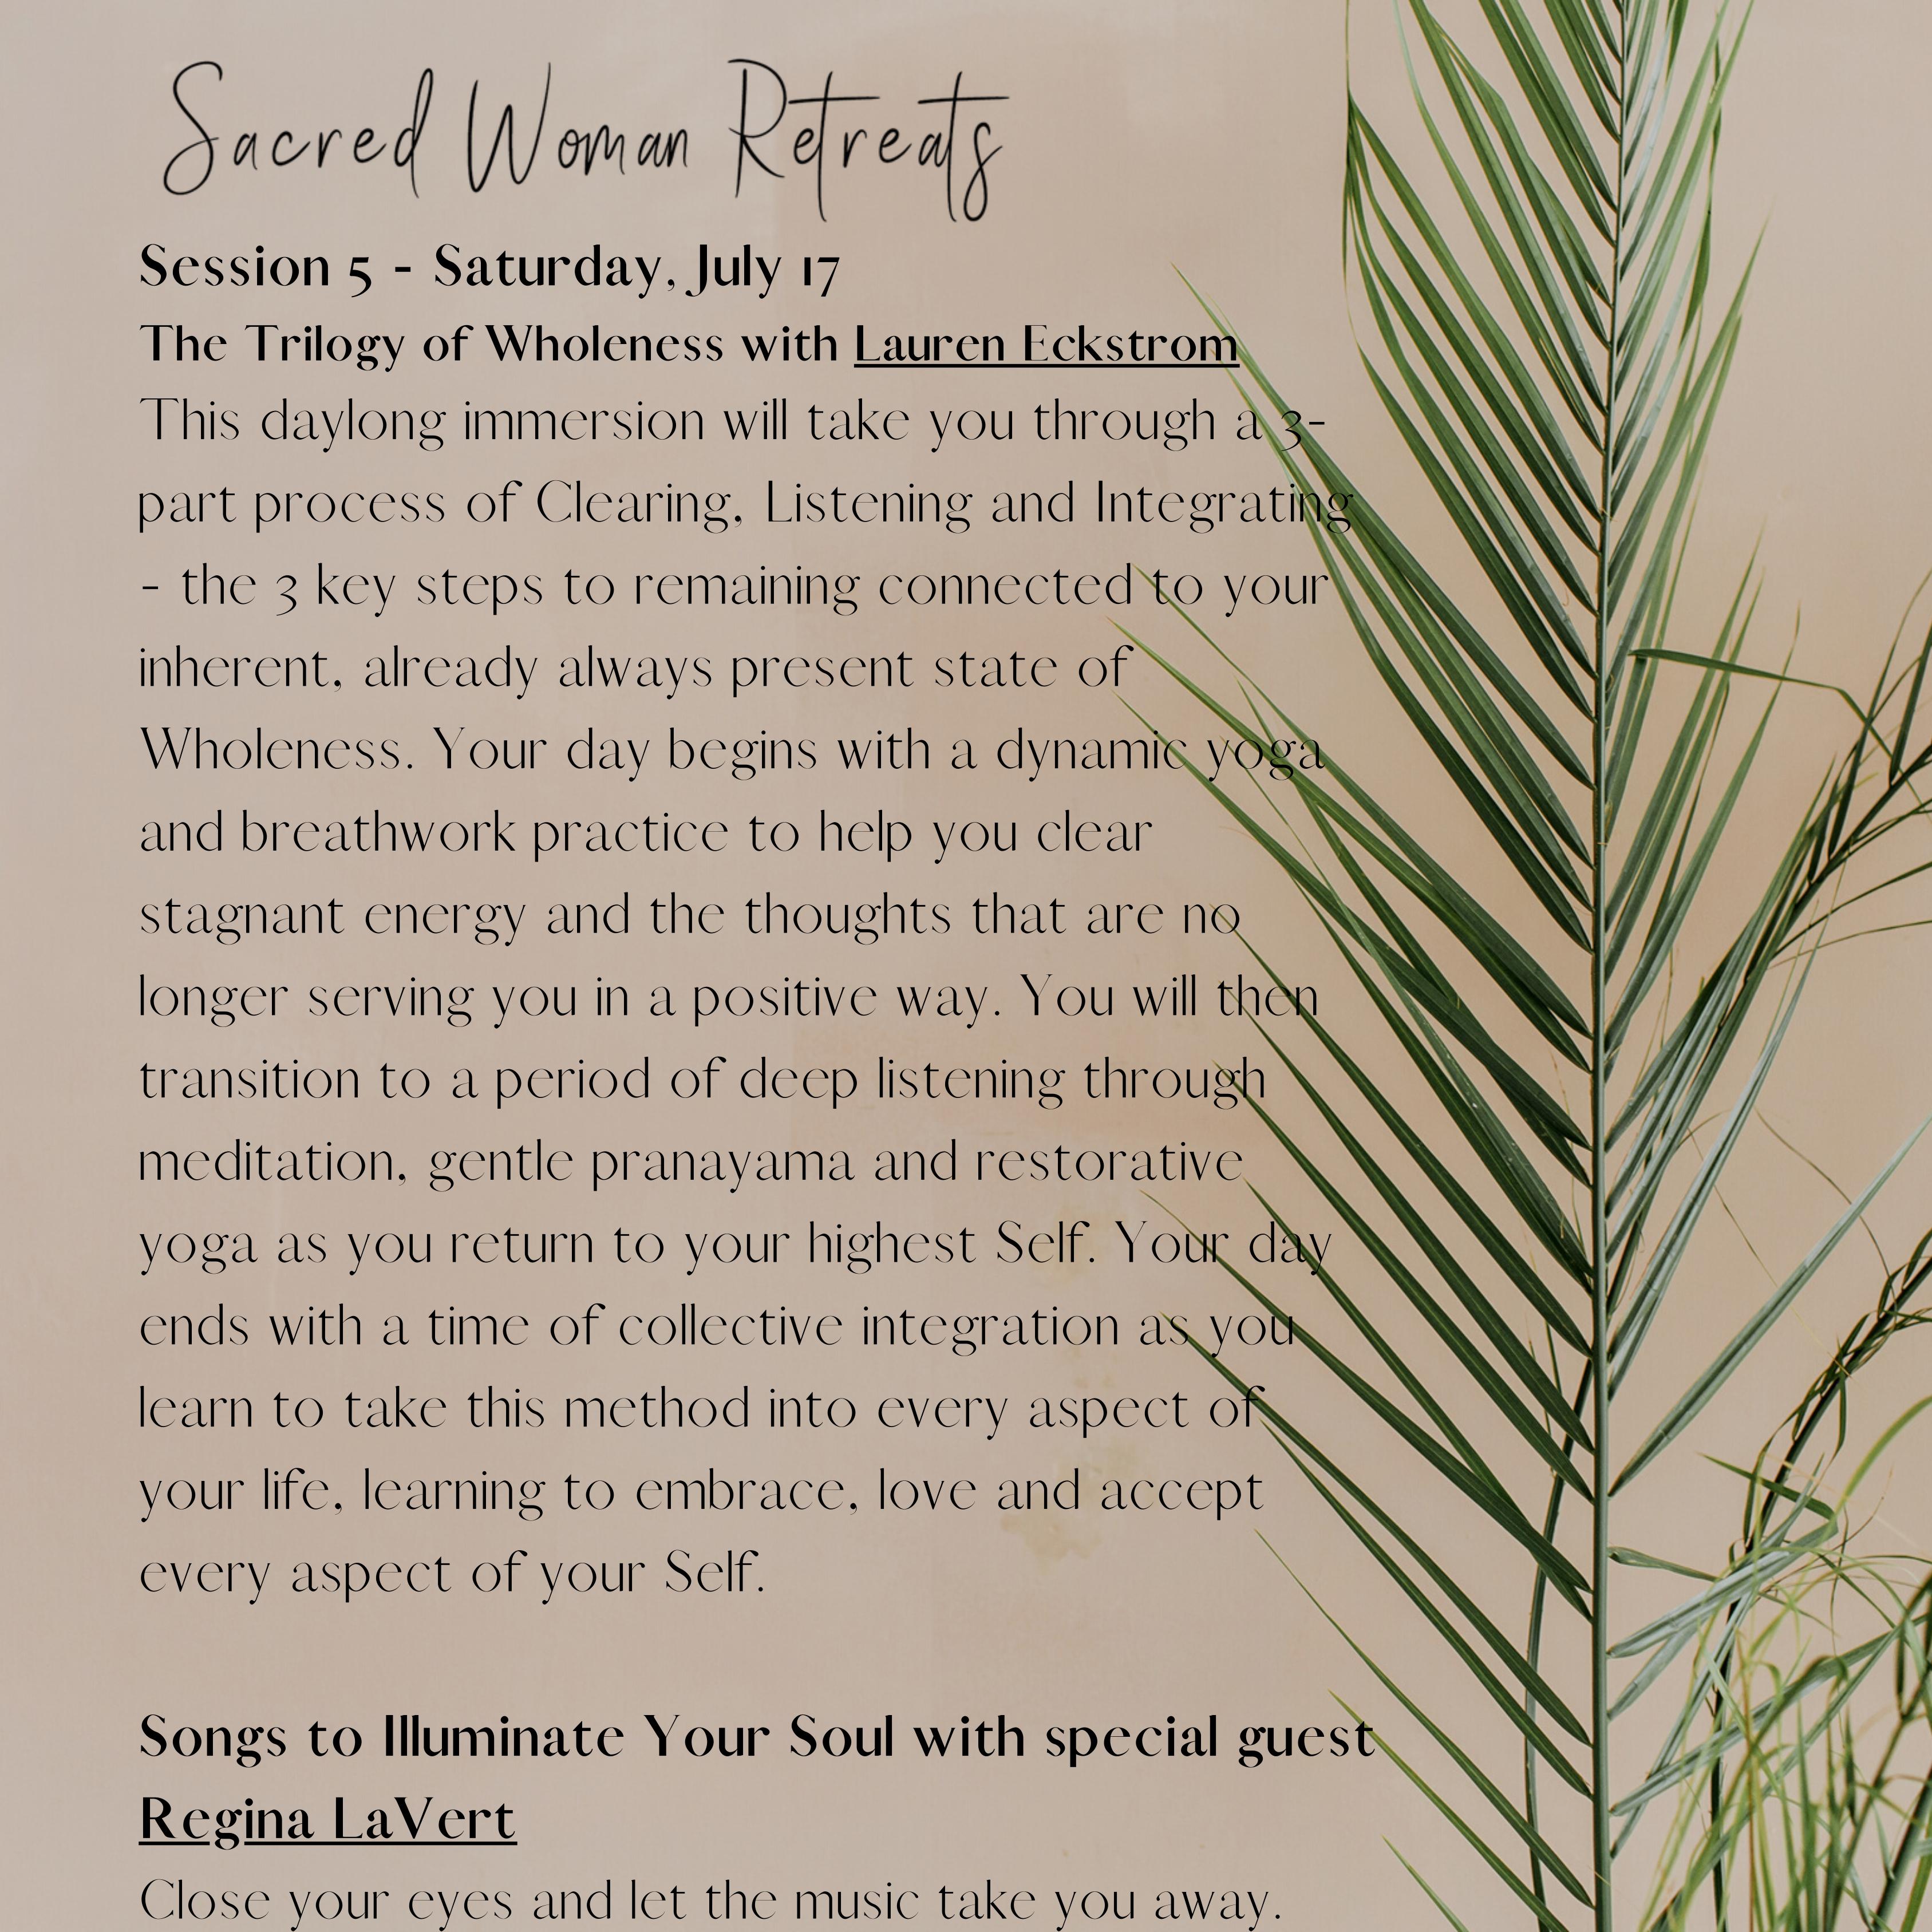 Women's Sacred Retreat | Day 5